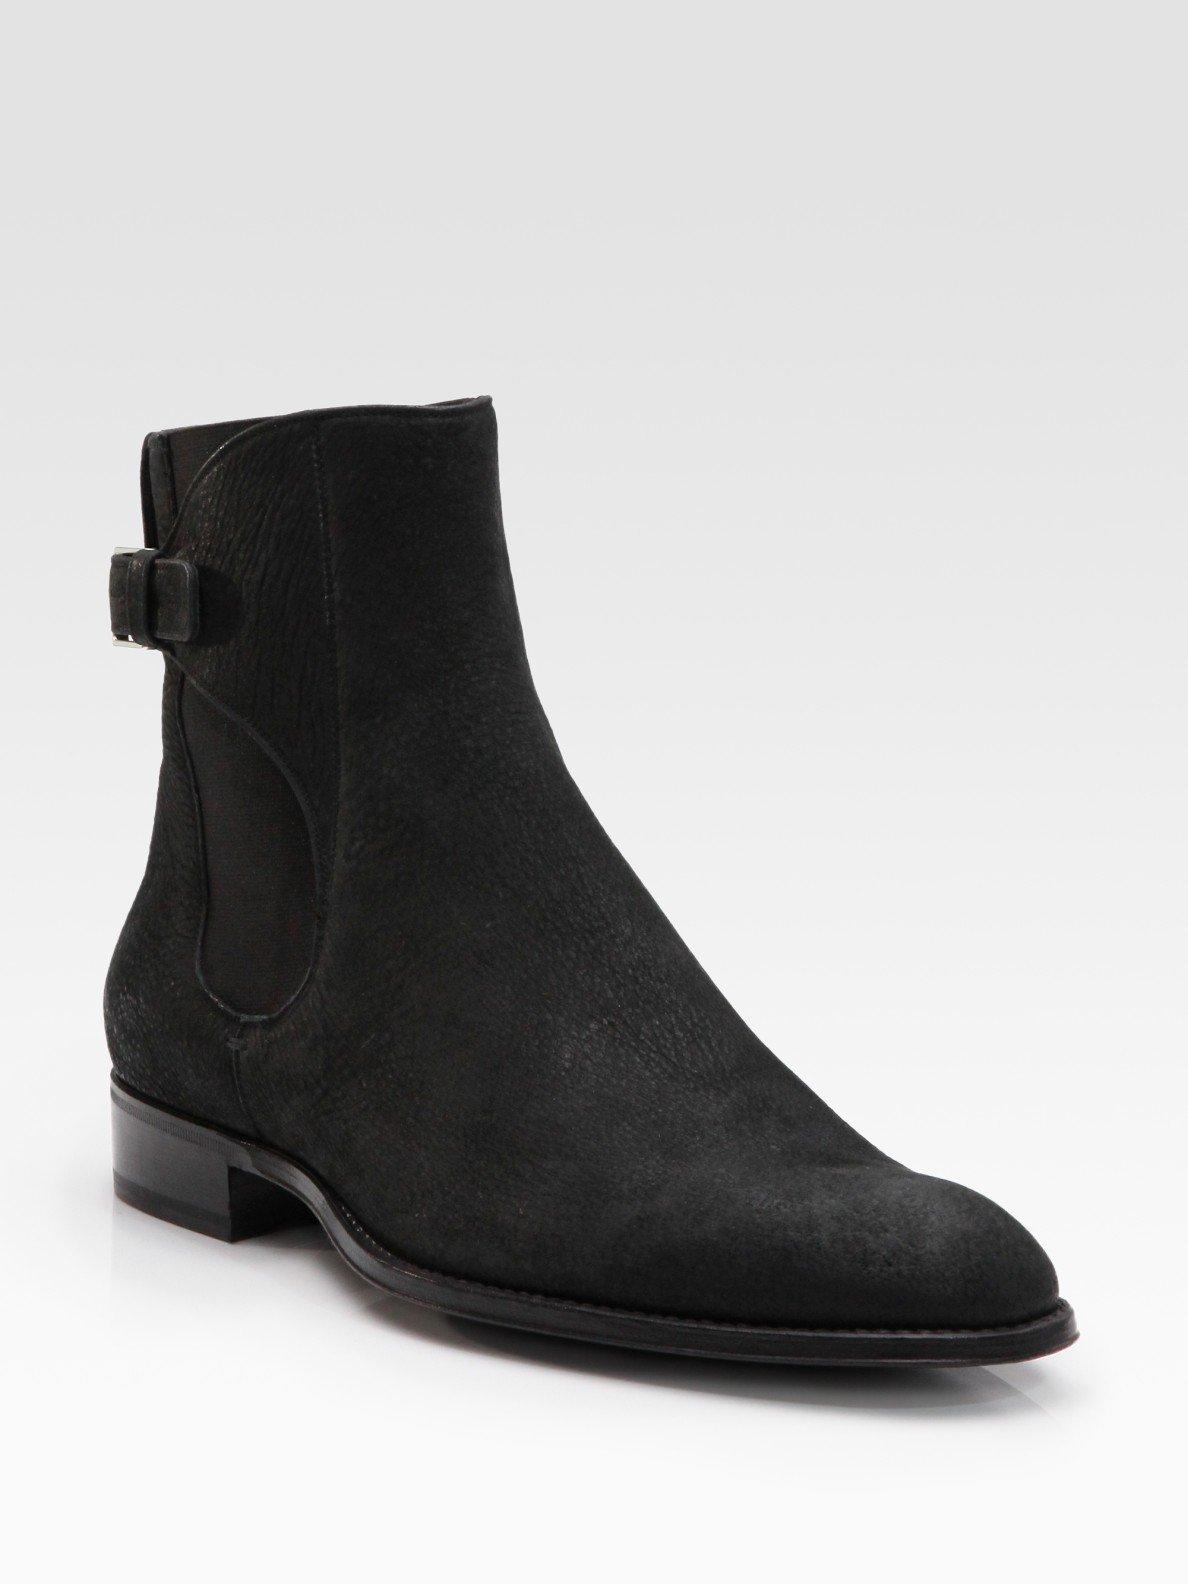 dior homme buffalo leather ankle boots in black for men lyst. Black Bedroom Furniture Sets. Home Design Ideas